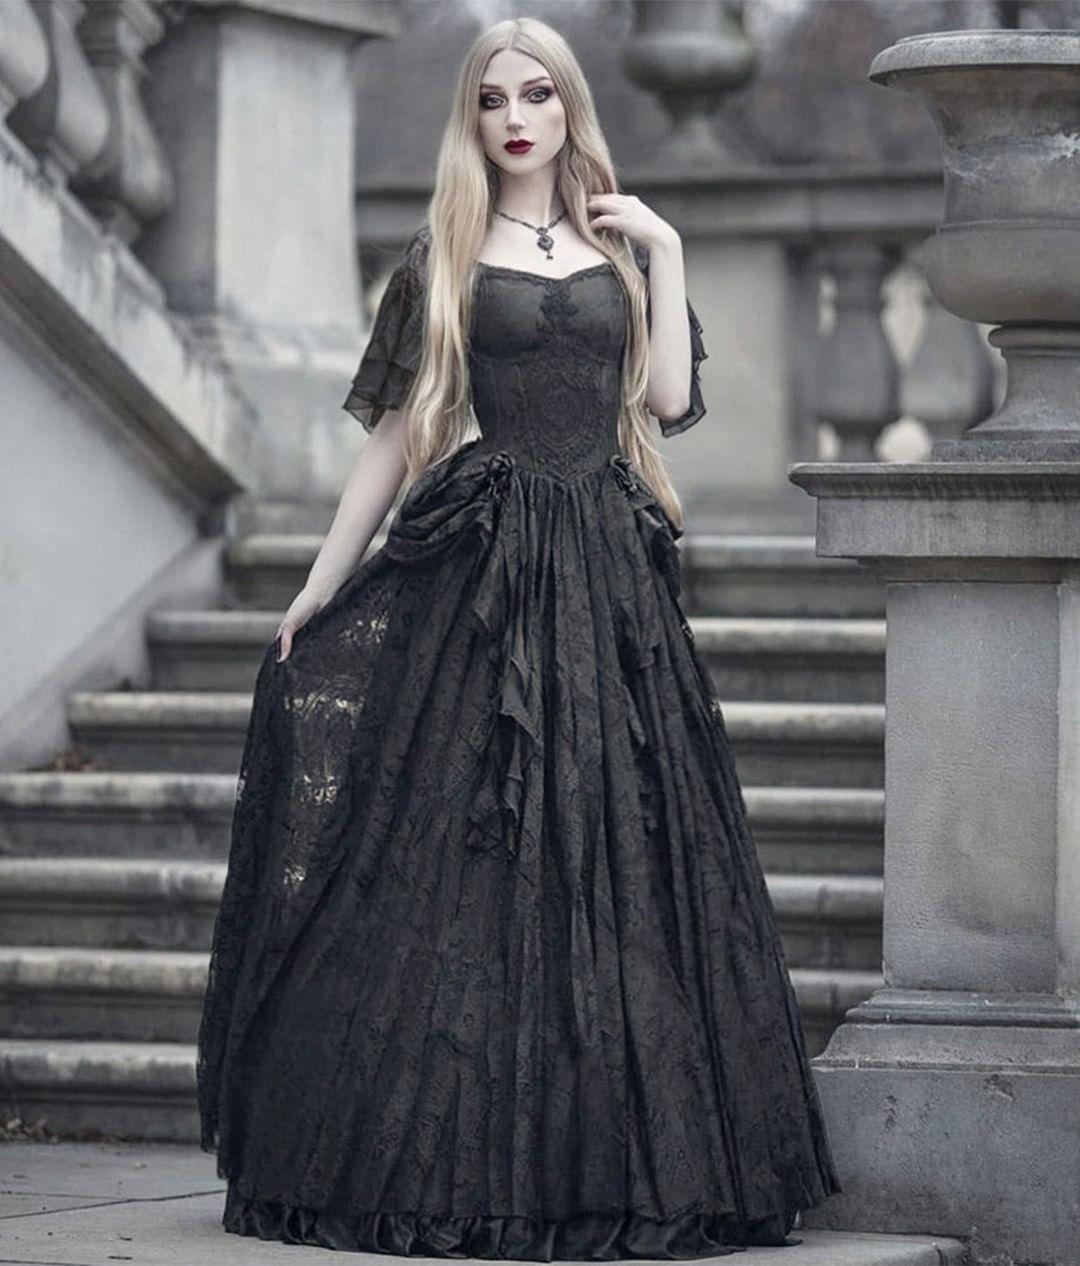 Darkincloset On Instagram Classic Beauty Dress Reference Oq 391 Model Absentia Veil Darkinclose Gothic Victorian Dresses Vampire Dress Gothic Prom Dress [ 1266 x 1080 Pixel ]